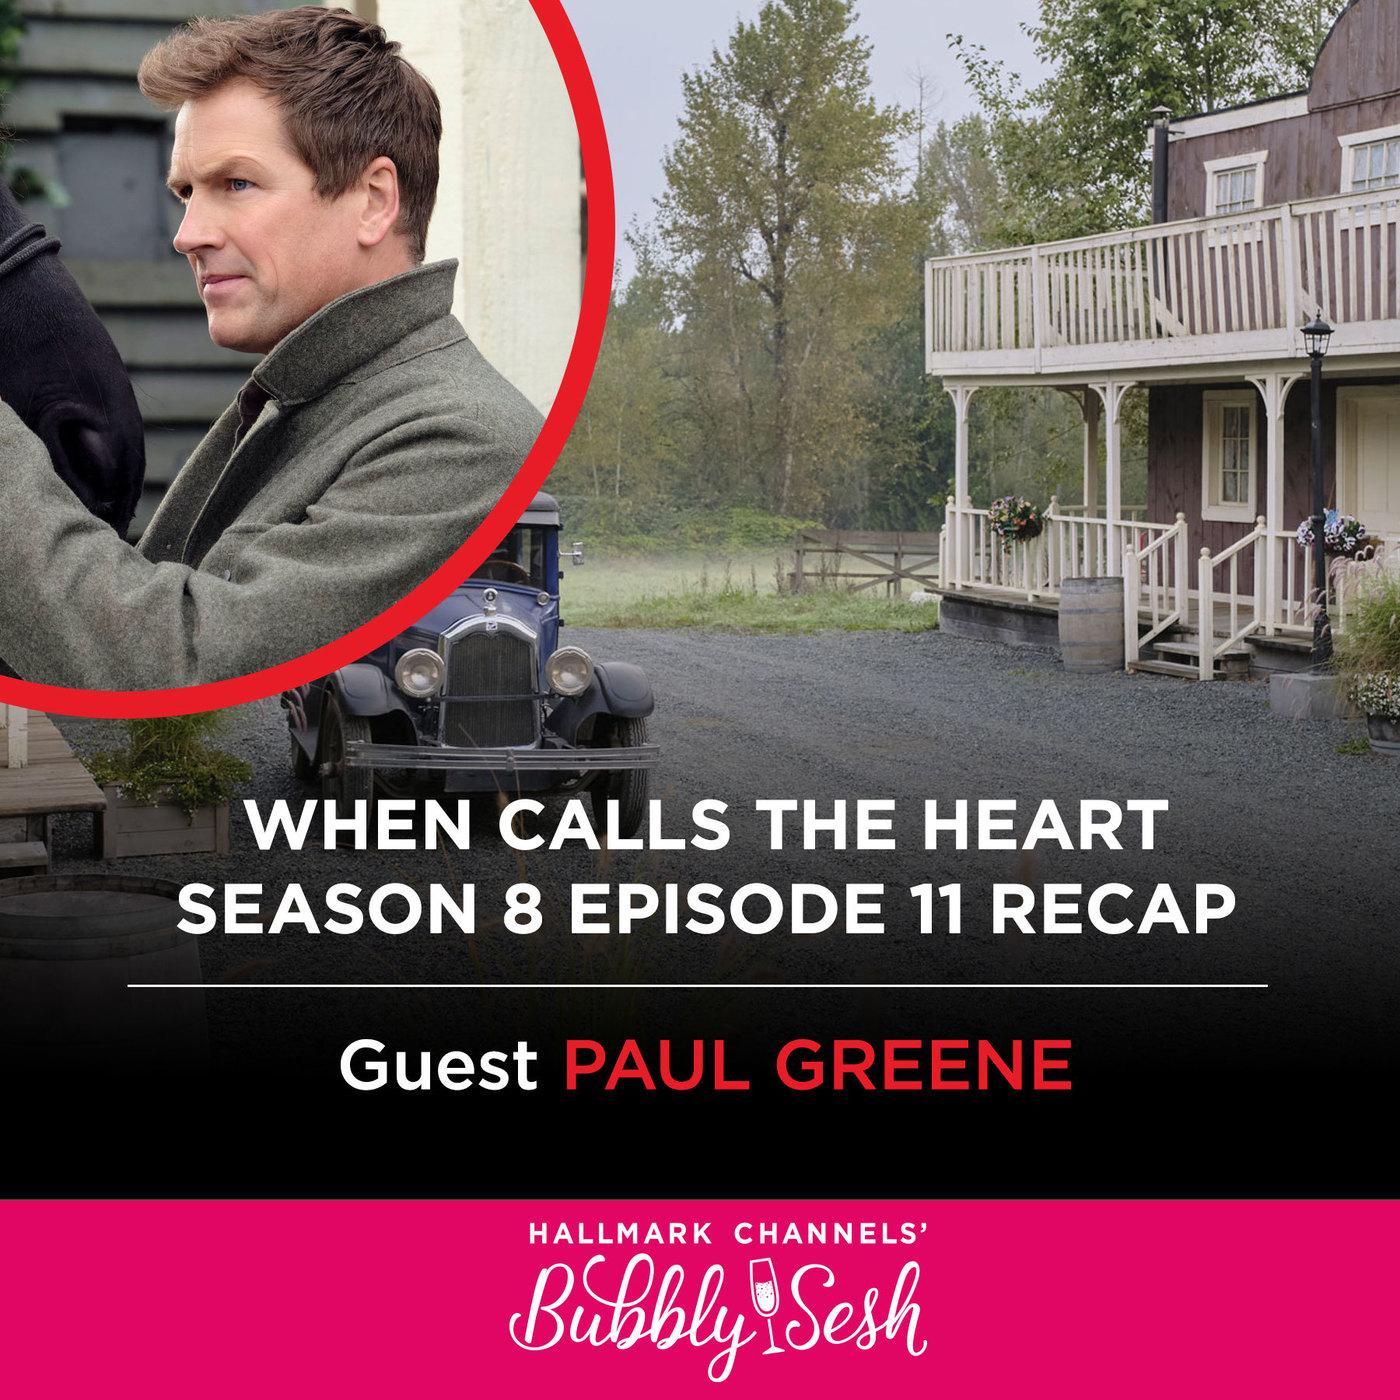 When Calls the Heart Episode 11 Recap with Guest Paul Greene